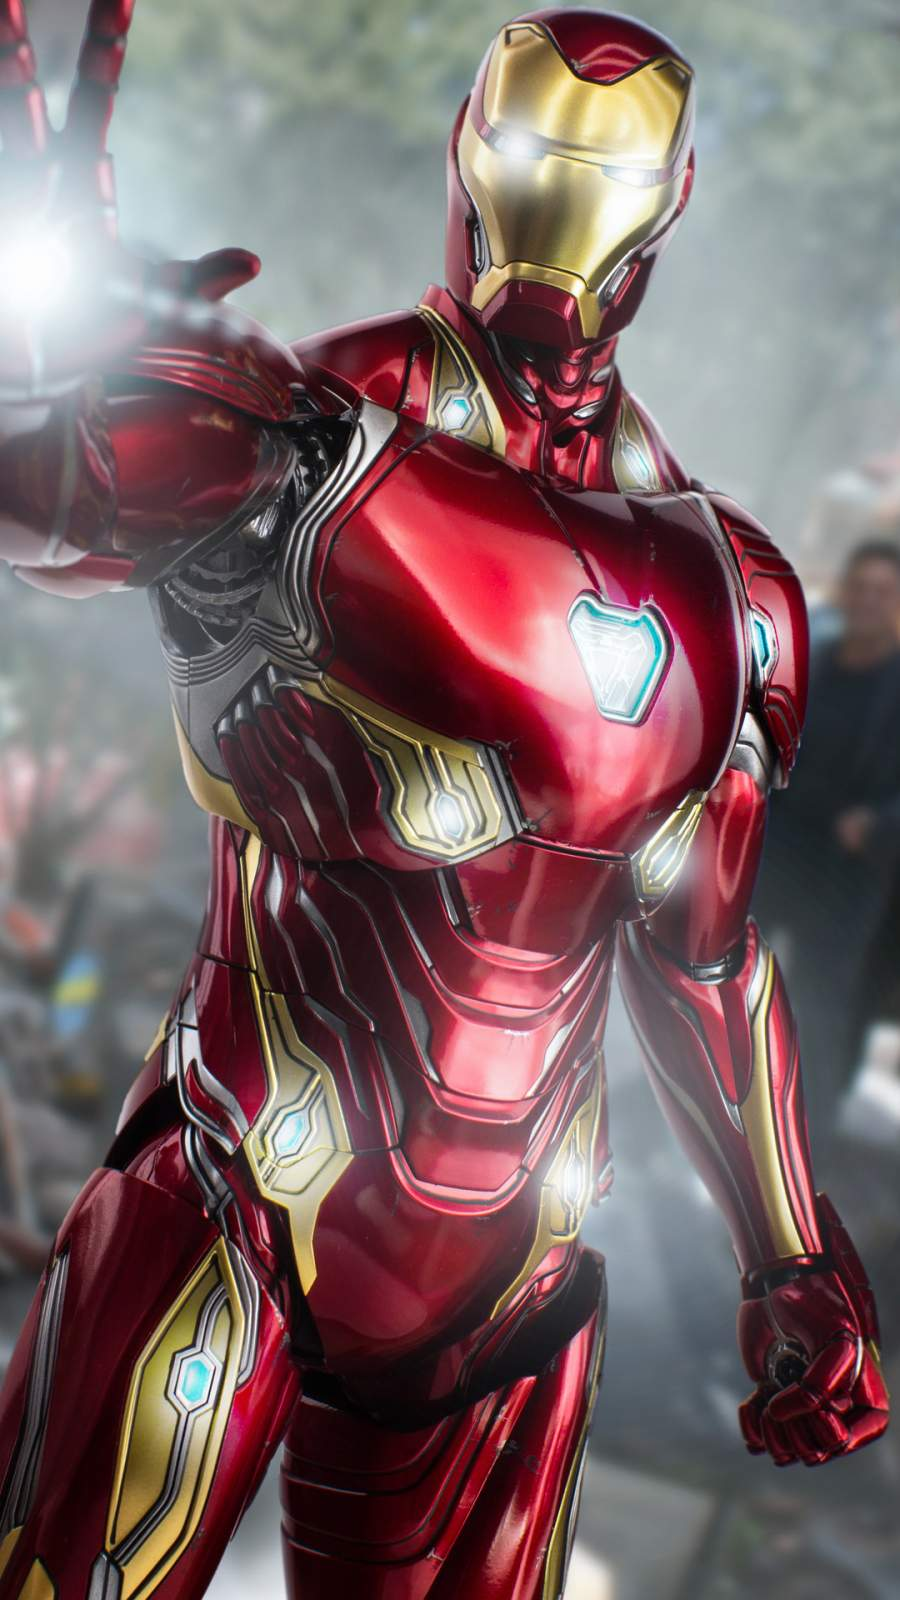 Iron Man Mark 50 4K iPhone Wallpaper